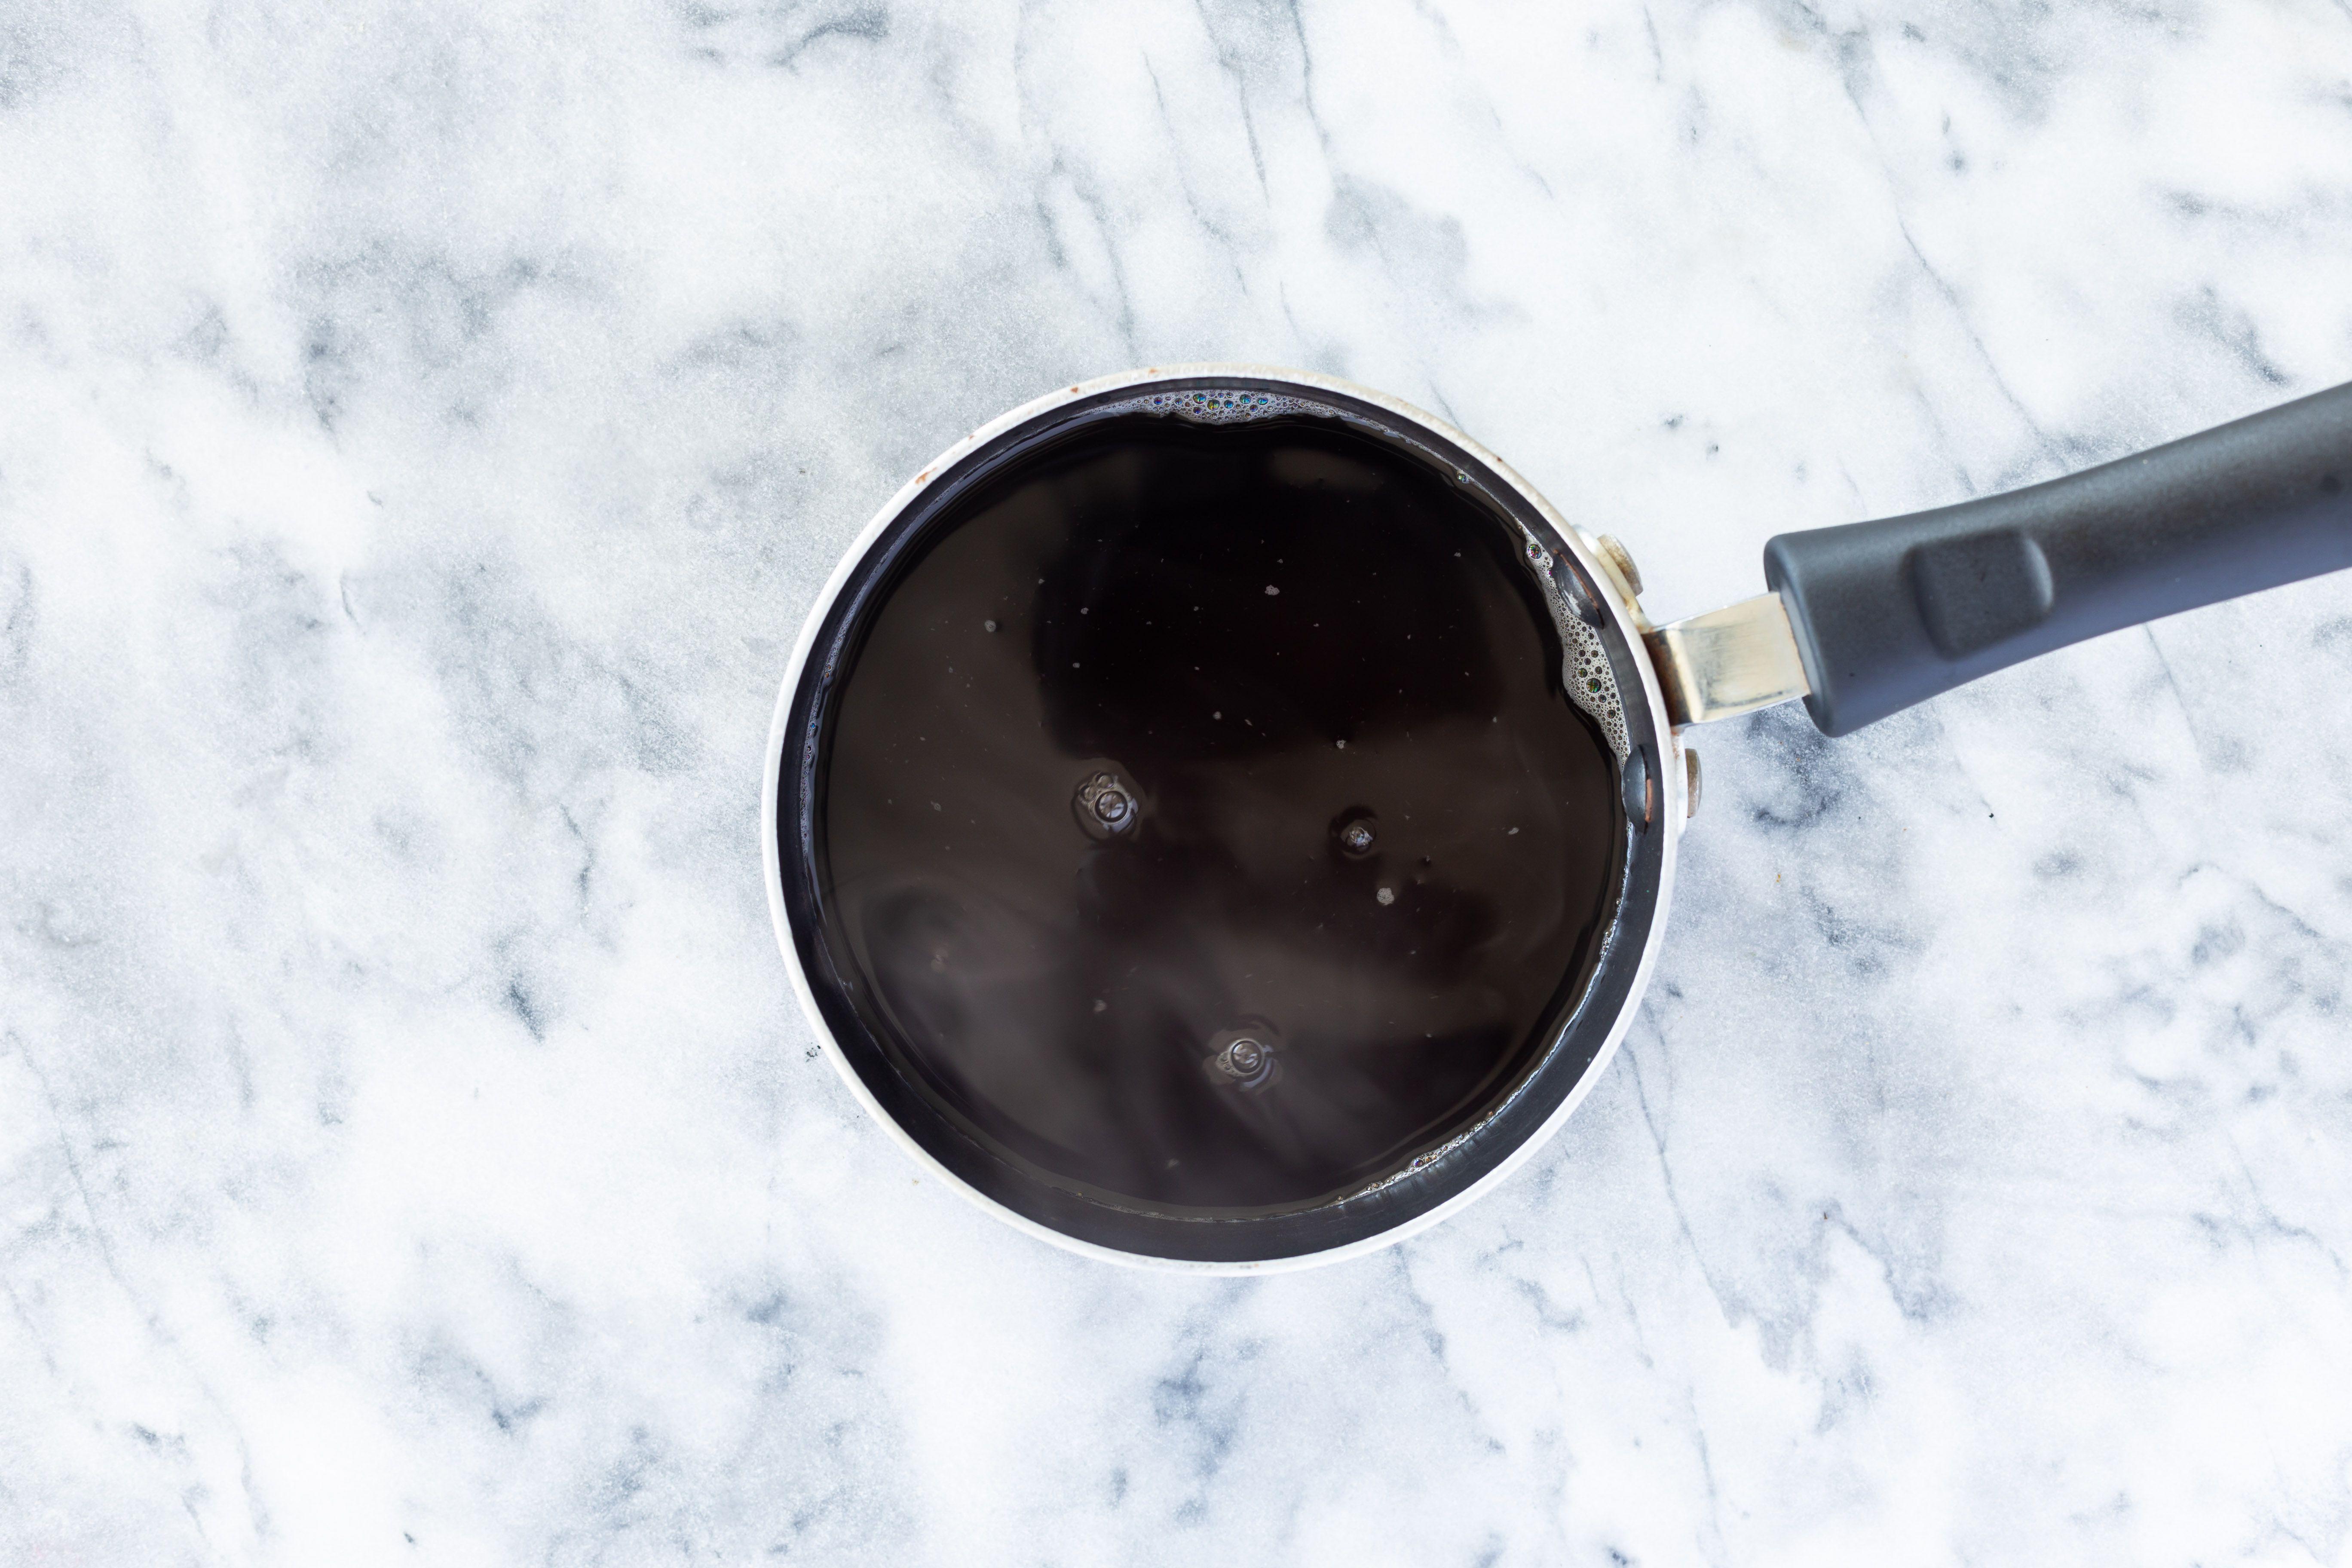 Brown sugar and water in a saucepan